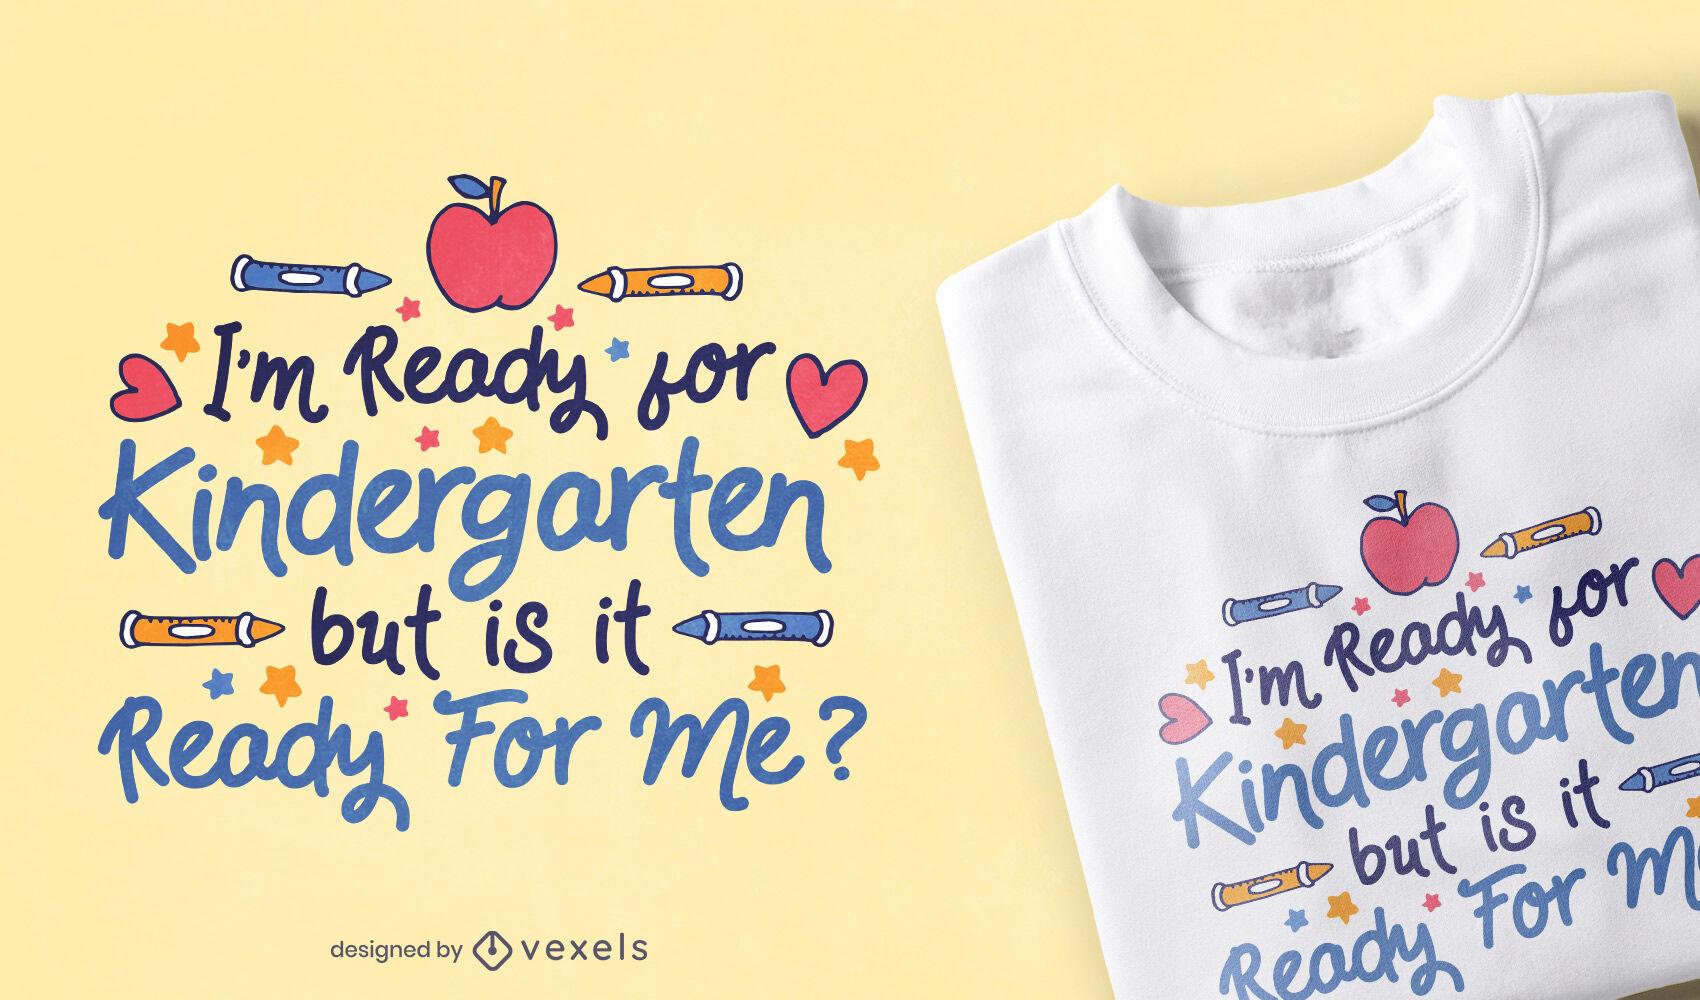 Kindergarden cute quote t-shirt design